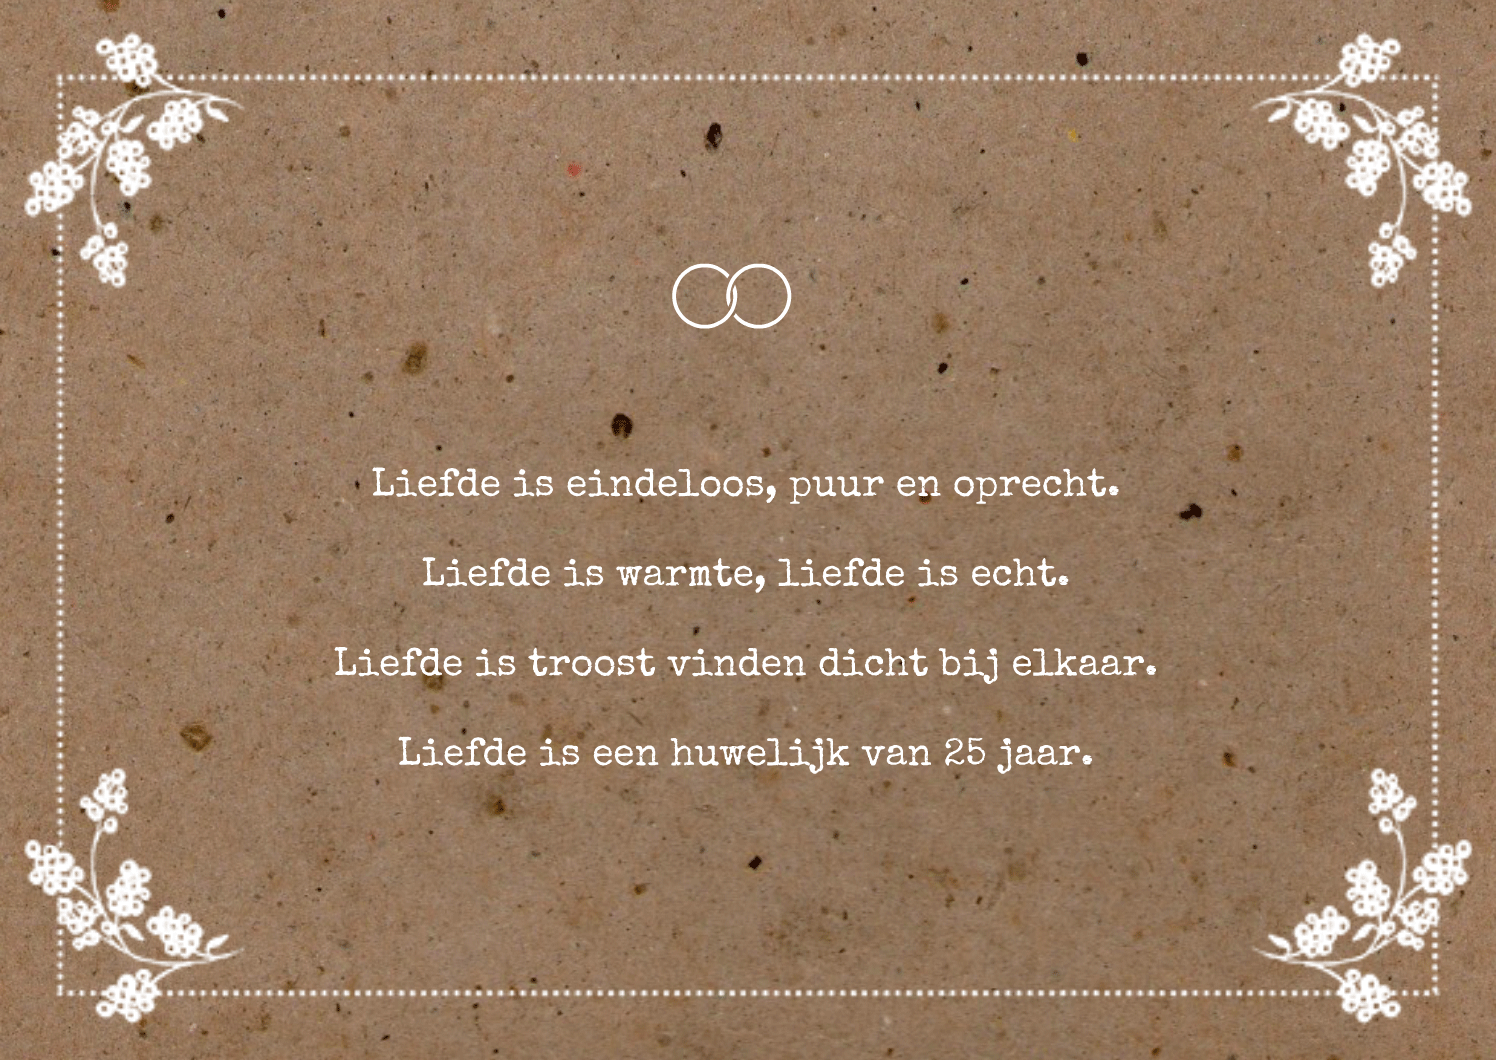 gedicht 7 jaar getrouwd Jaar Getrouwd Gedicht #QN12 – Aboriginaltourismontario gedicht 7 jaar getrouwd